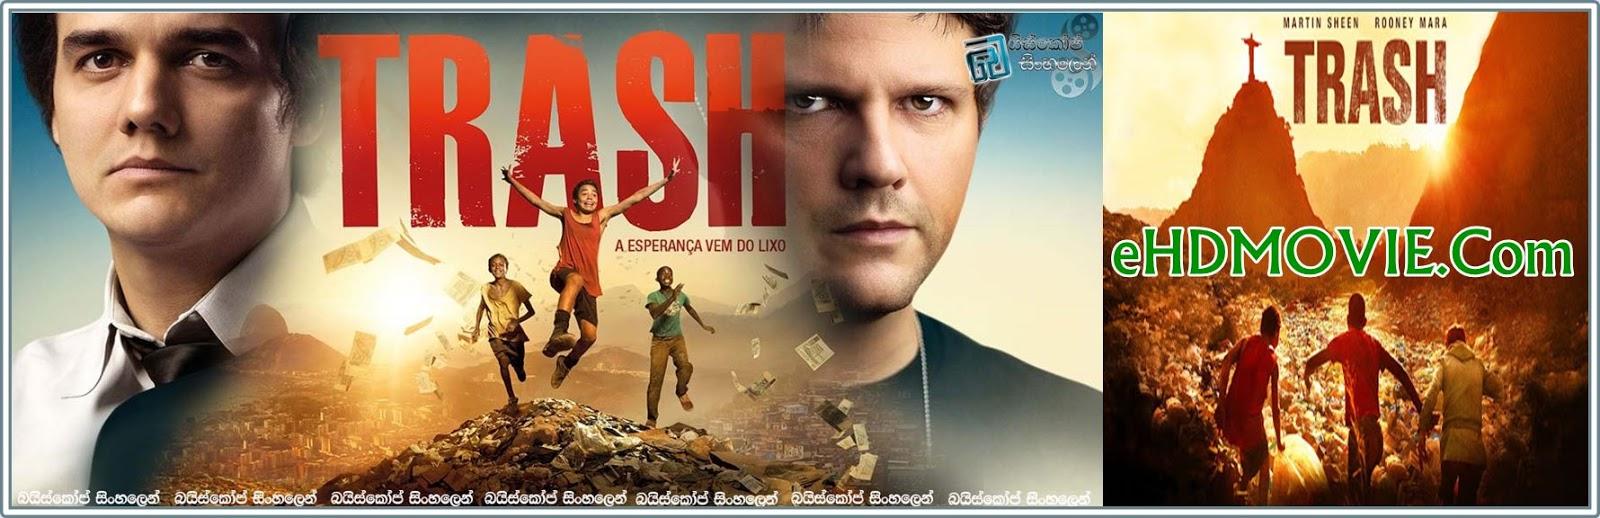 Trash 2014 Full Movie Brazilian 720p - 480p ORG BRRip 450MB - 750MB ESubs Free Download